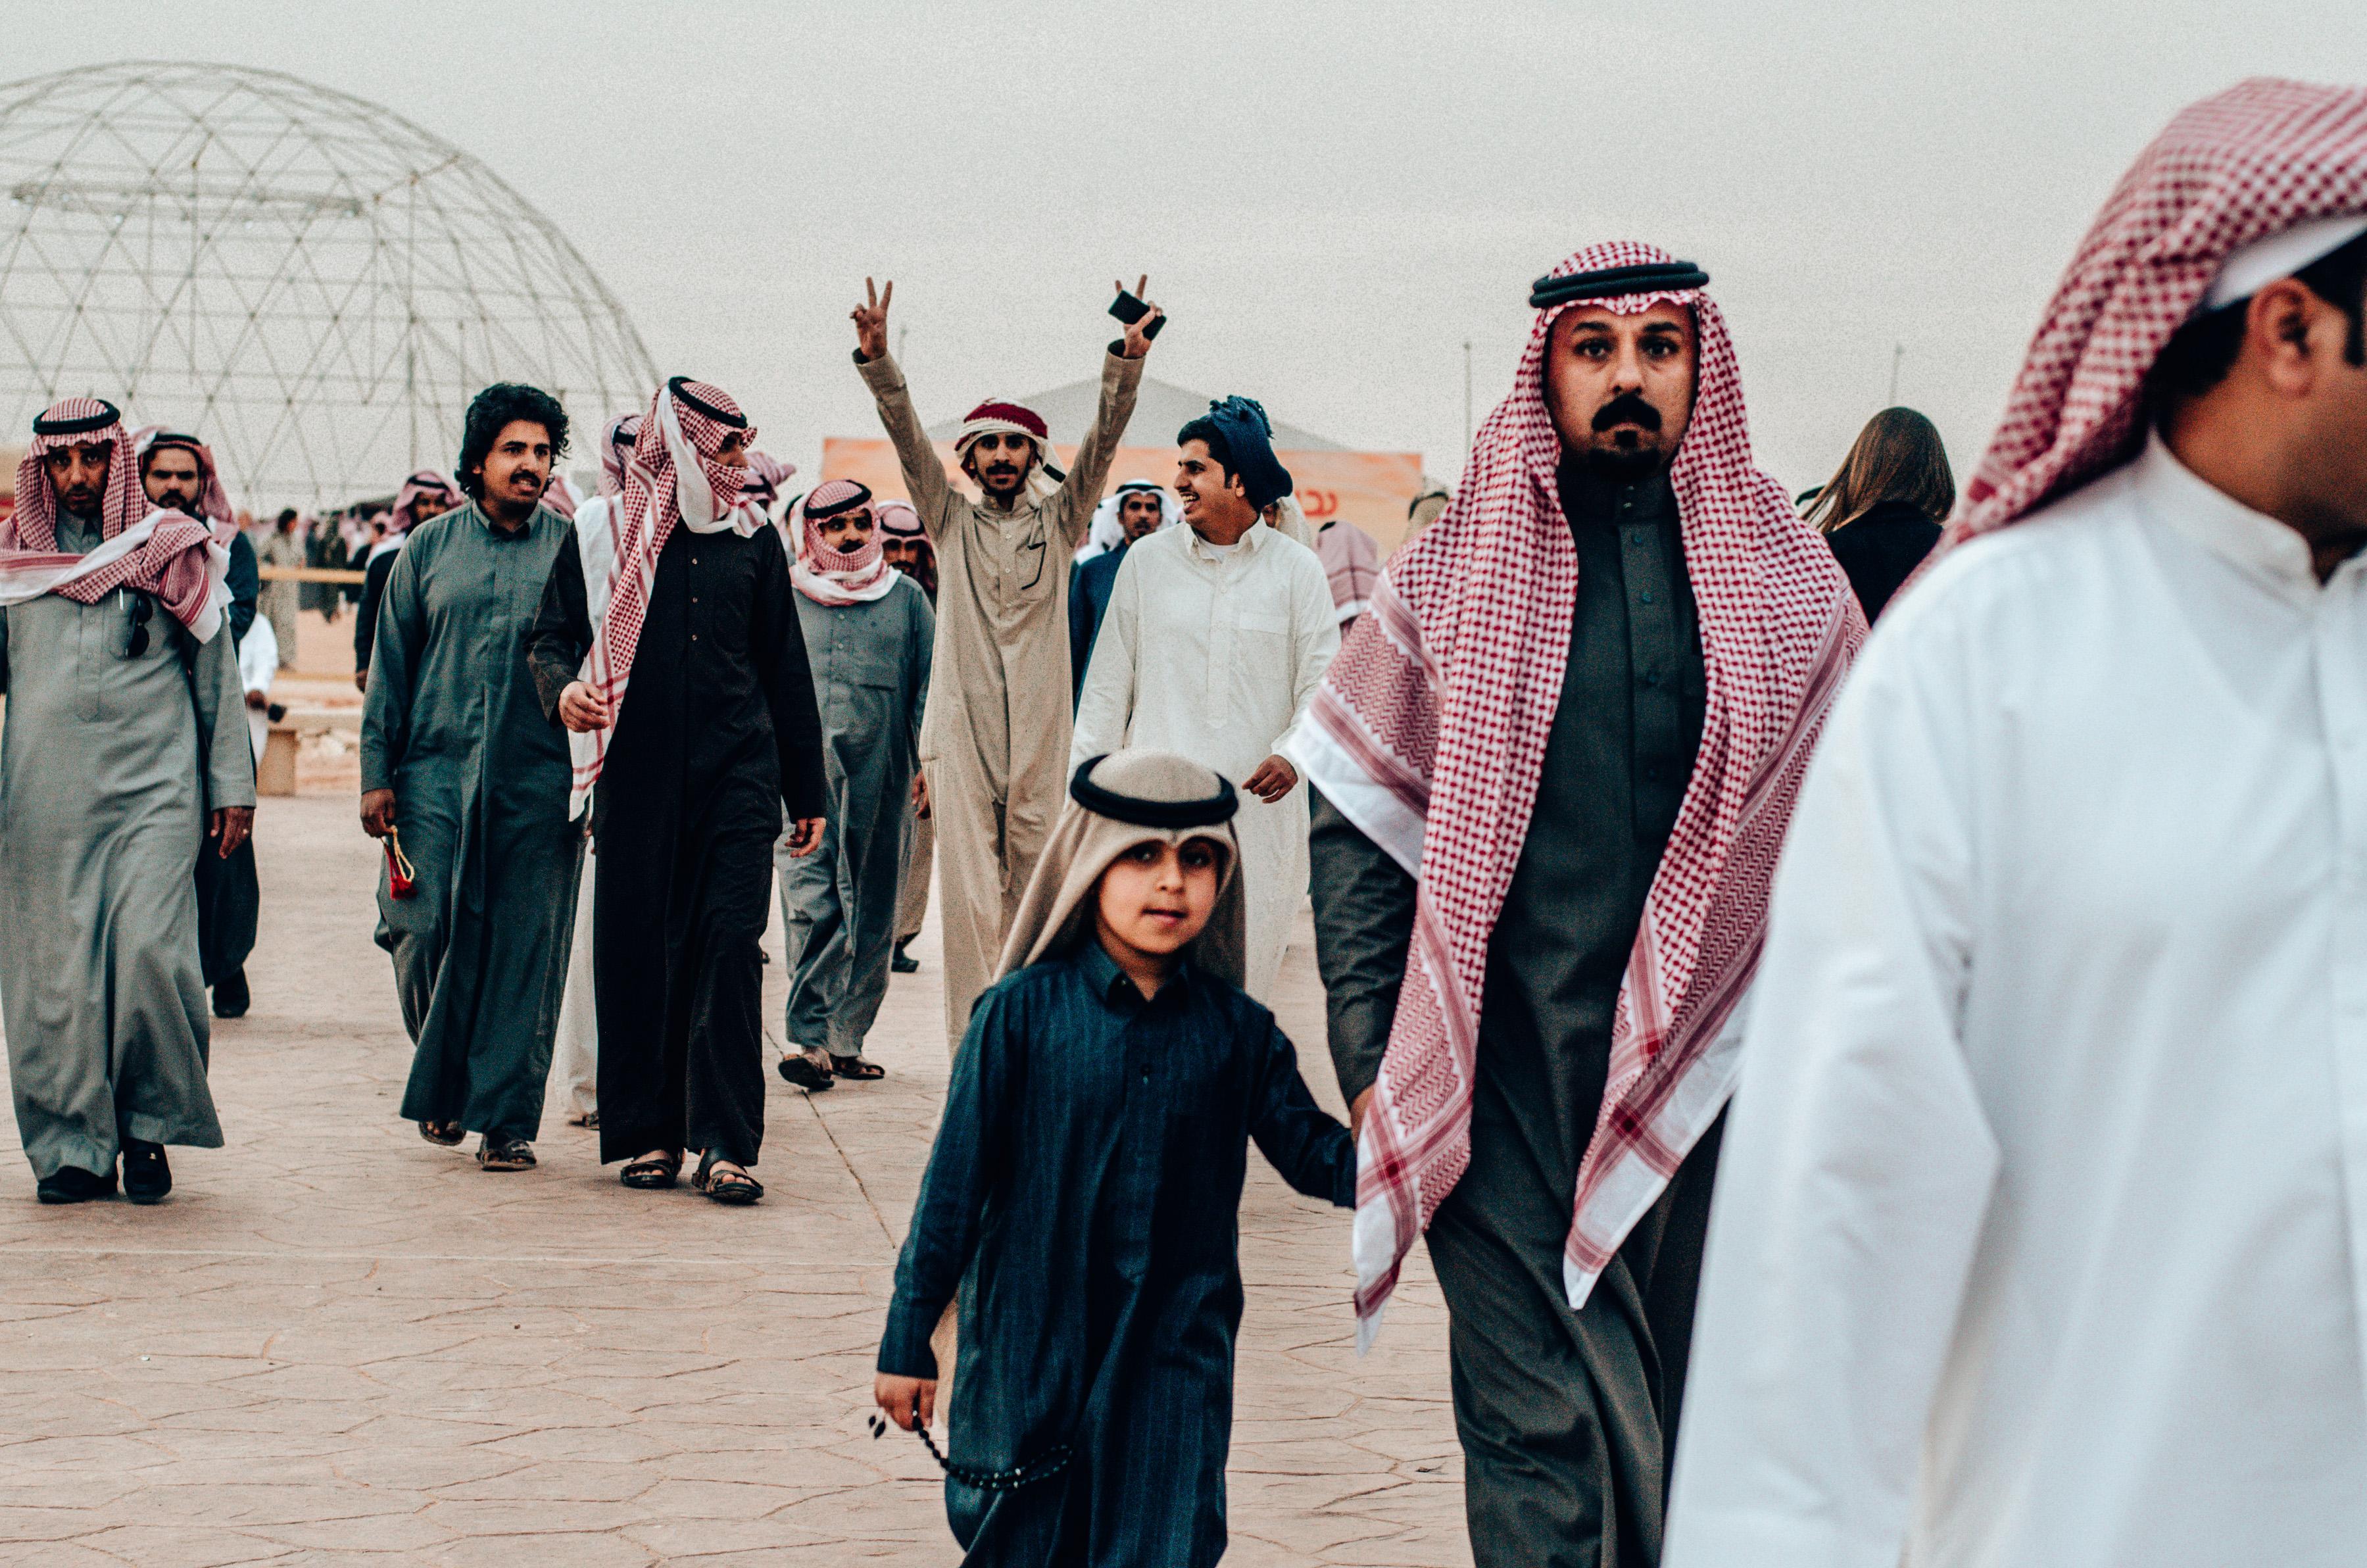 Going to Saudi Arabia? How to visit this desert kingdom